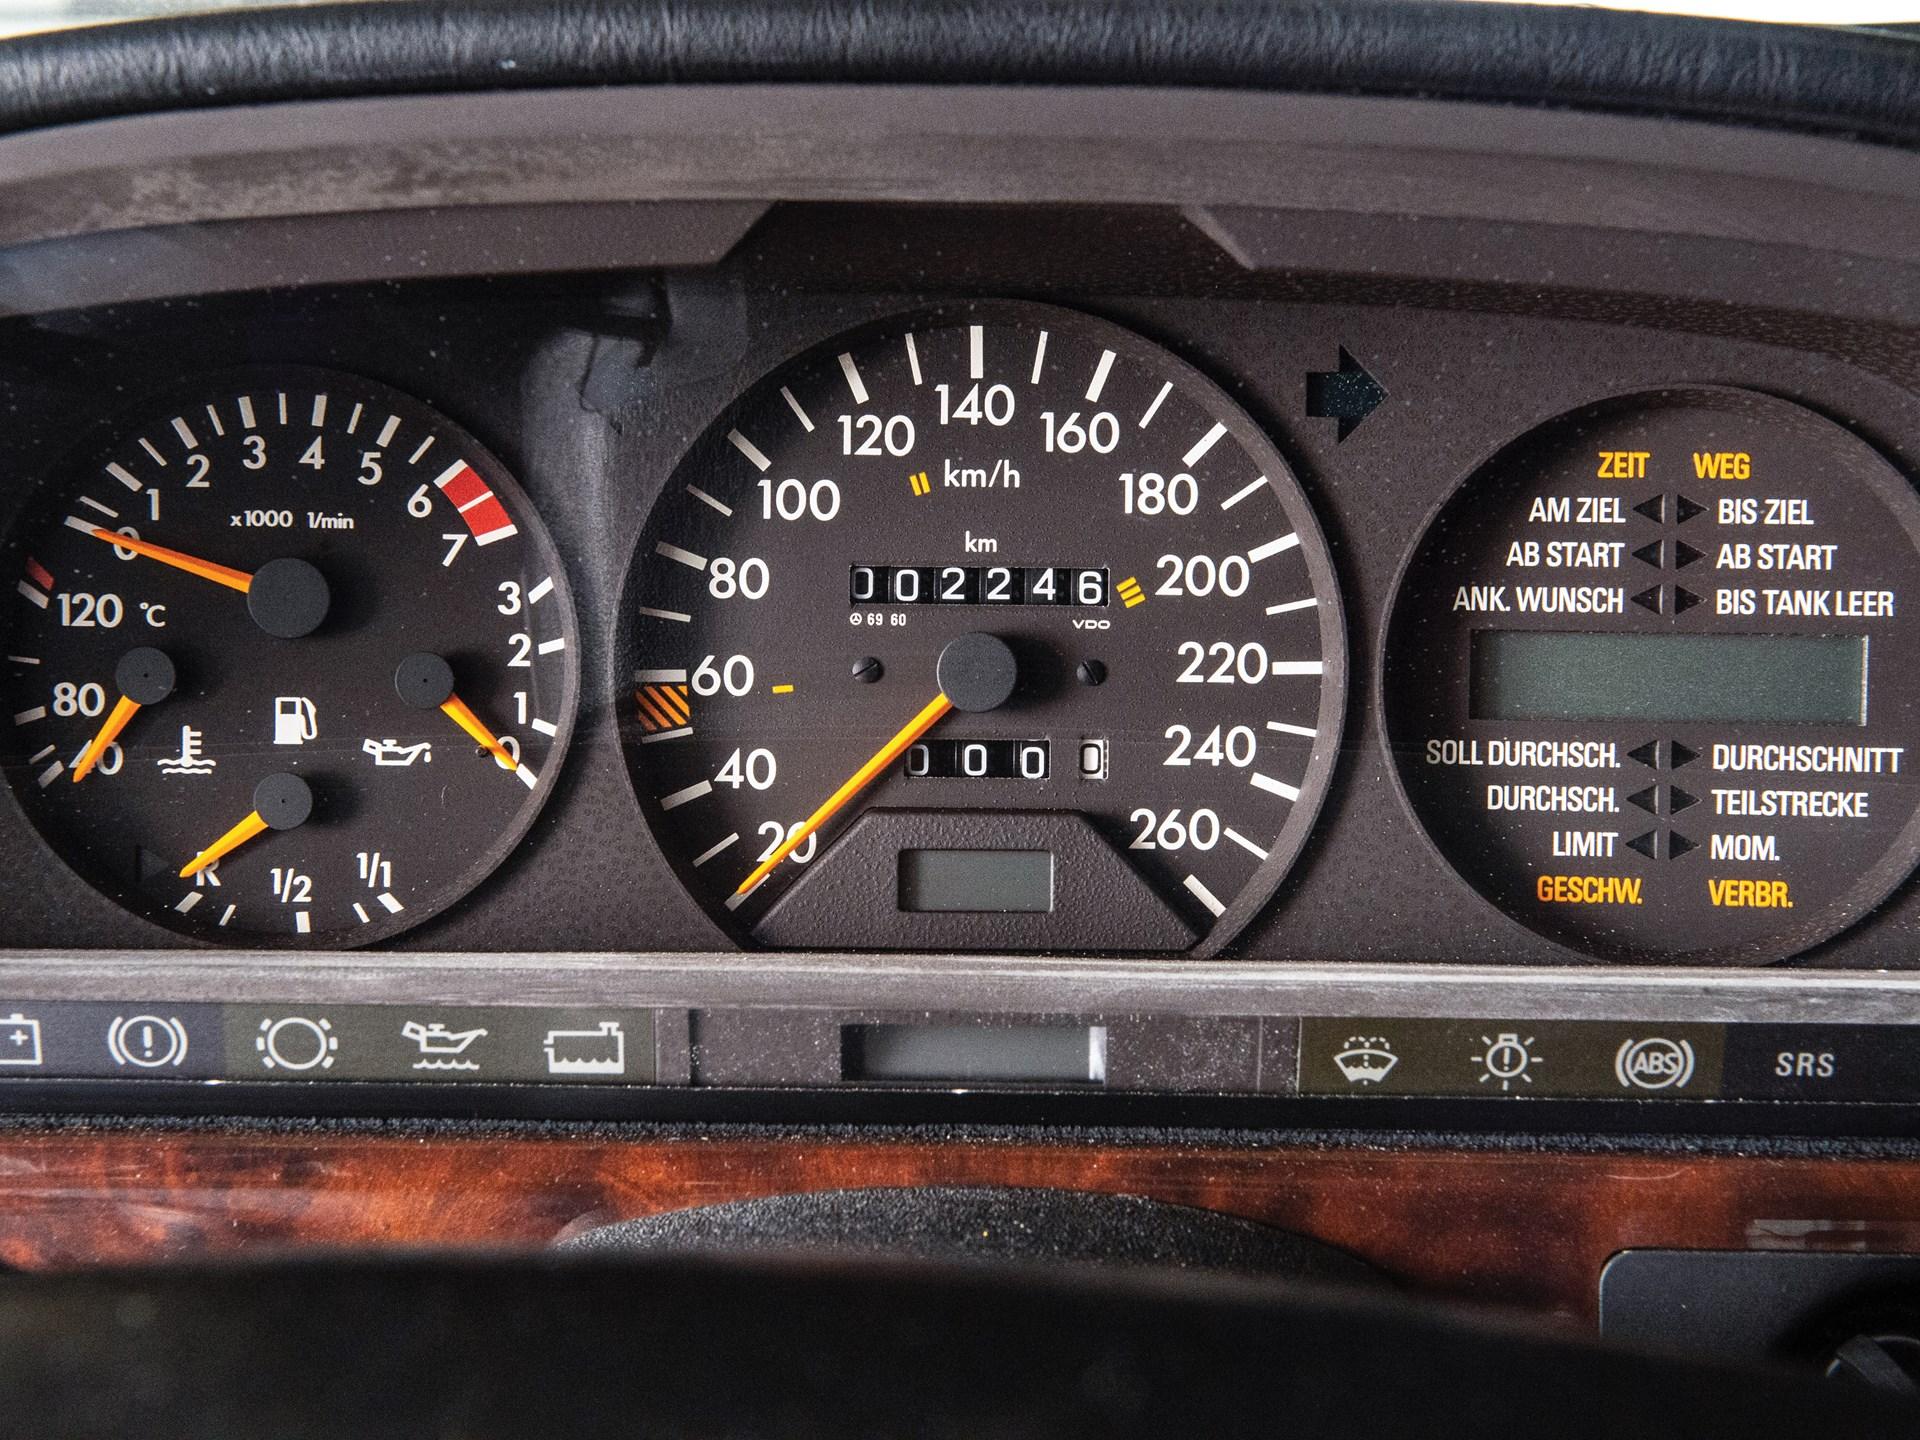 RM Sotheby's - 1990 Mercedes-Benz 560 SEL Limousine | Essen 2019